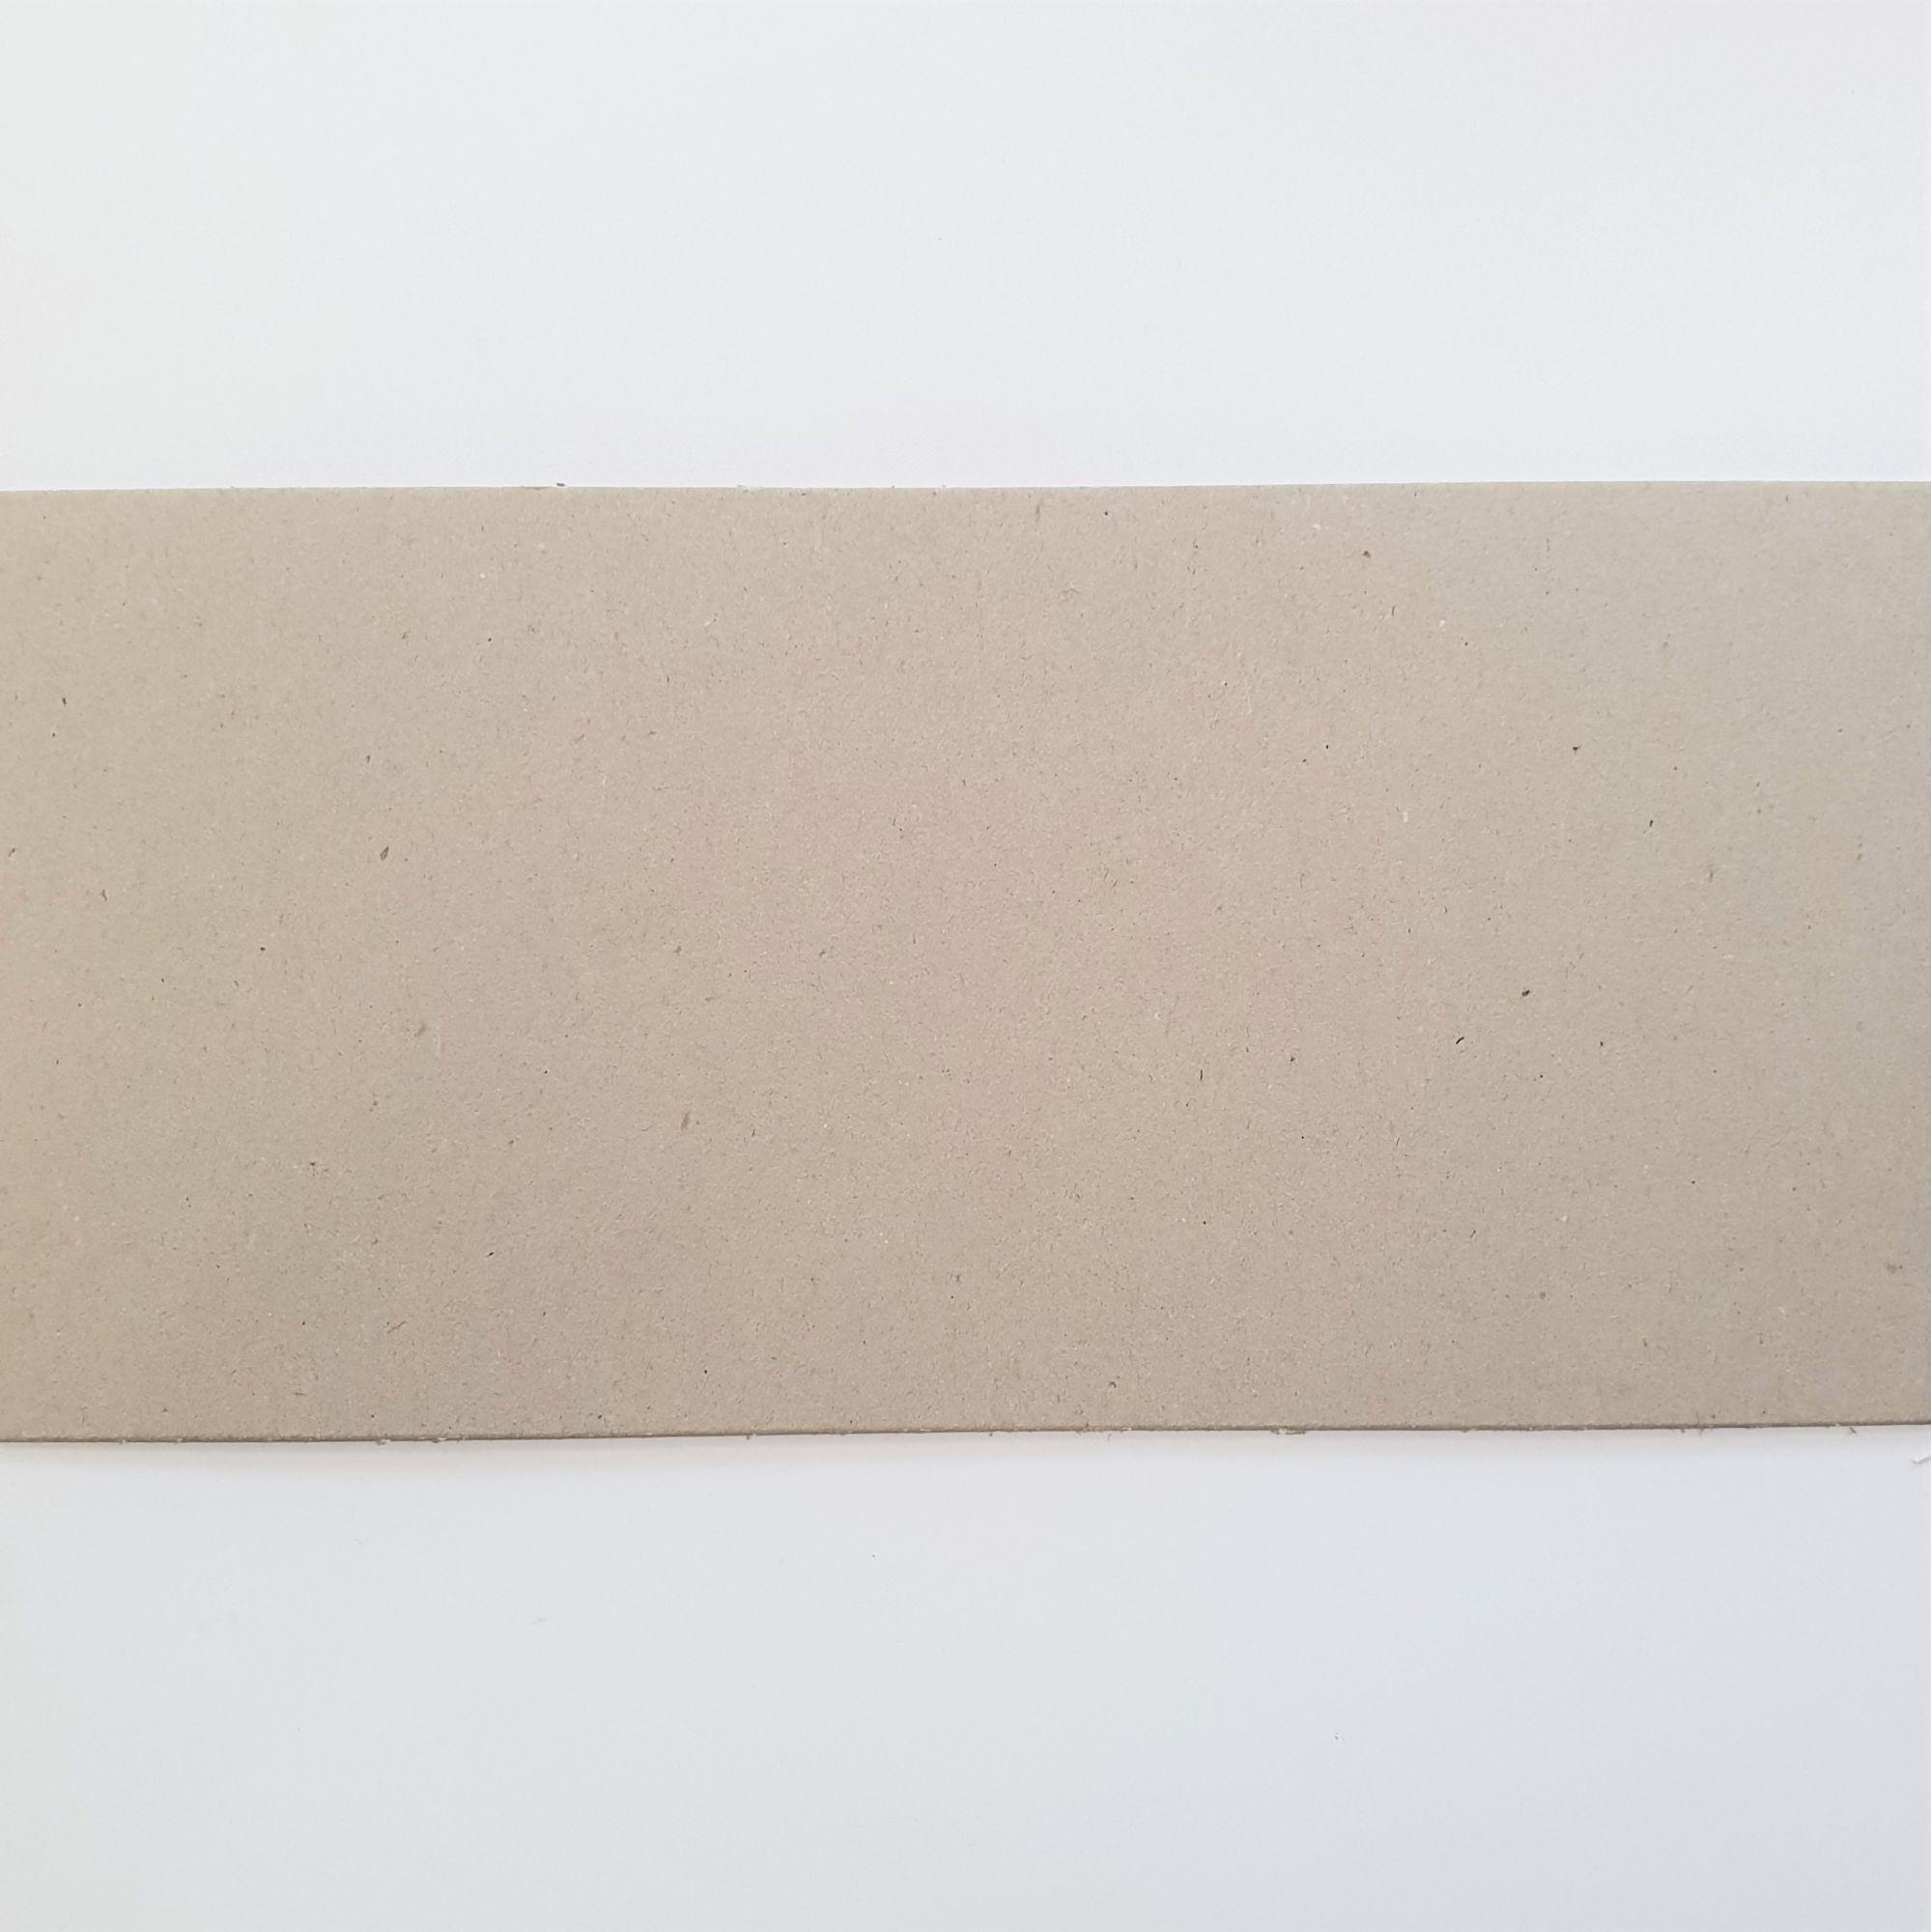 CHIPBOARD - CARTON GRIS - 15 X 30.5 CM